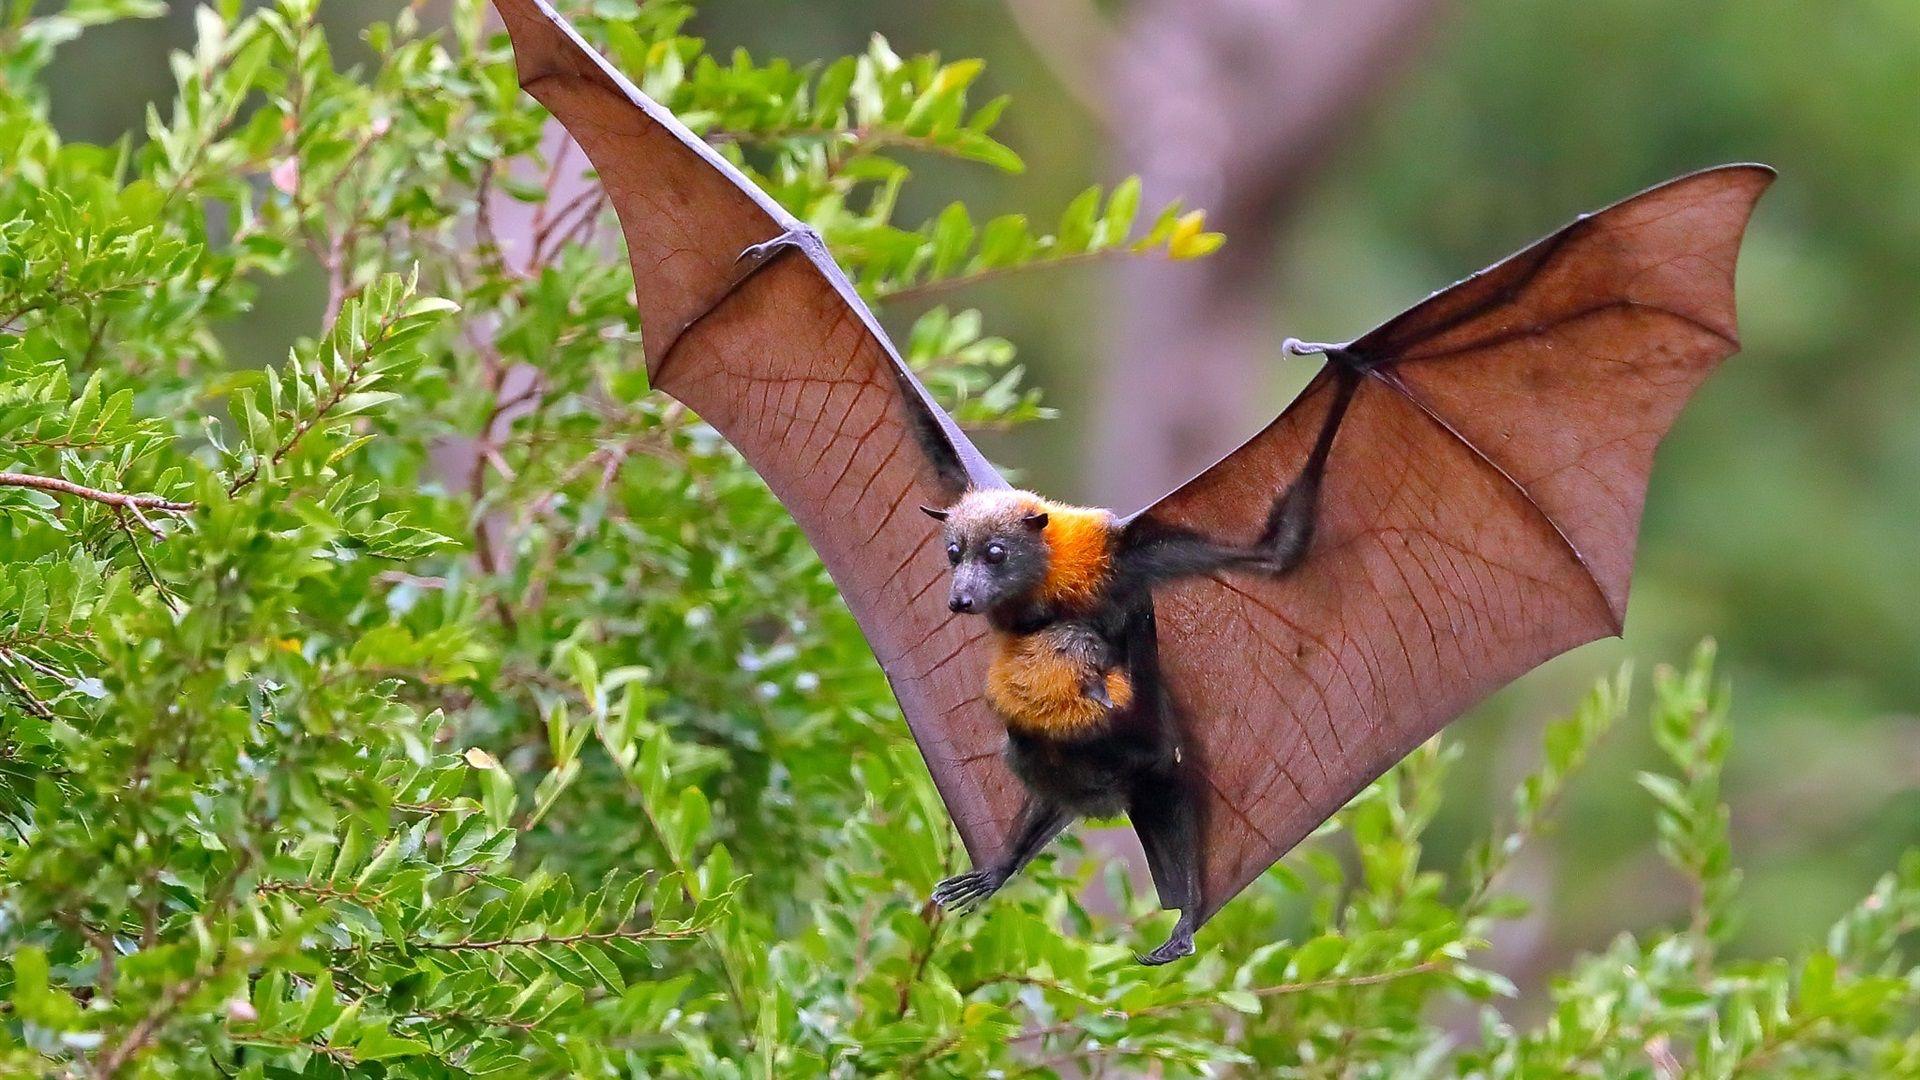 Animal おしゃれまとめの人気アイデア Pinterest Nebulo フルーツコウモリ 哺乳類 コウモリ